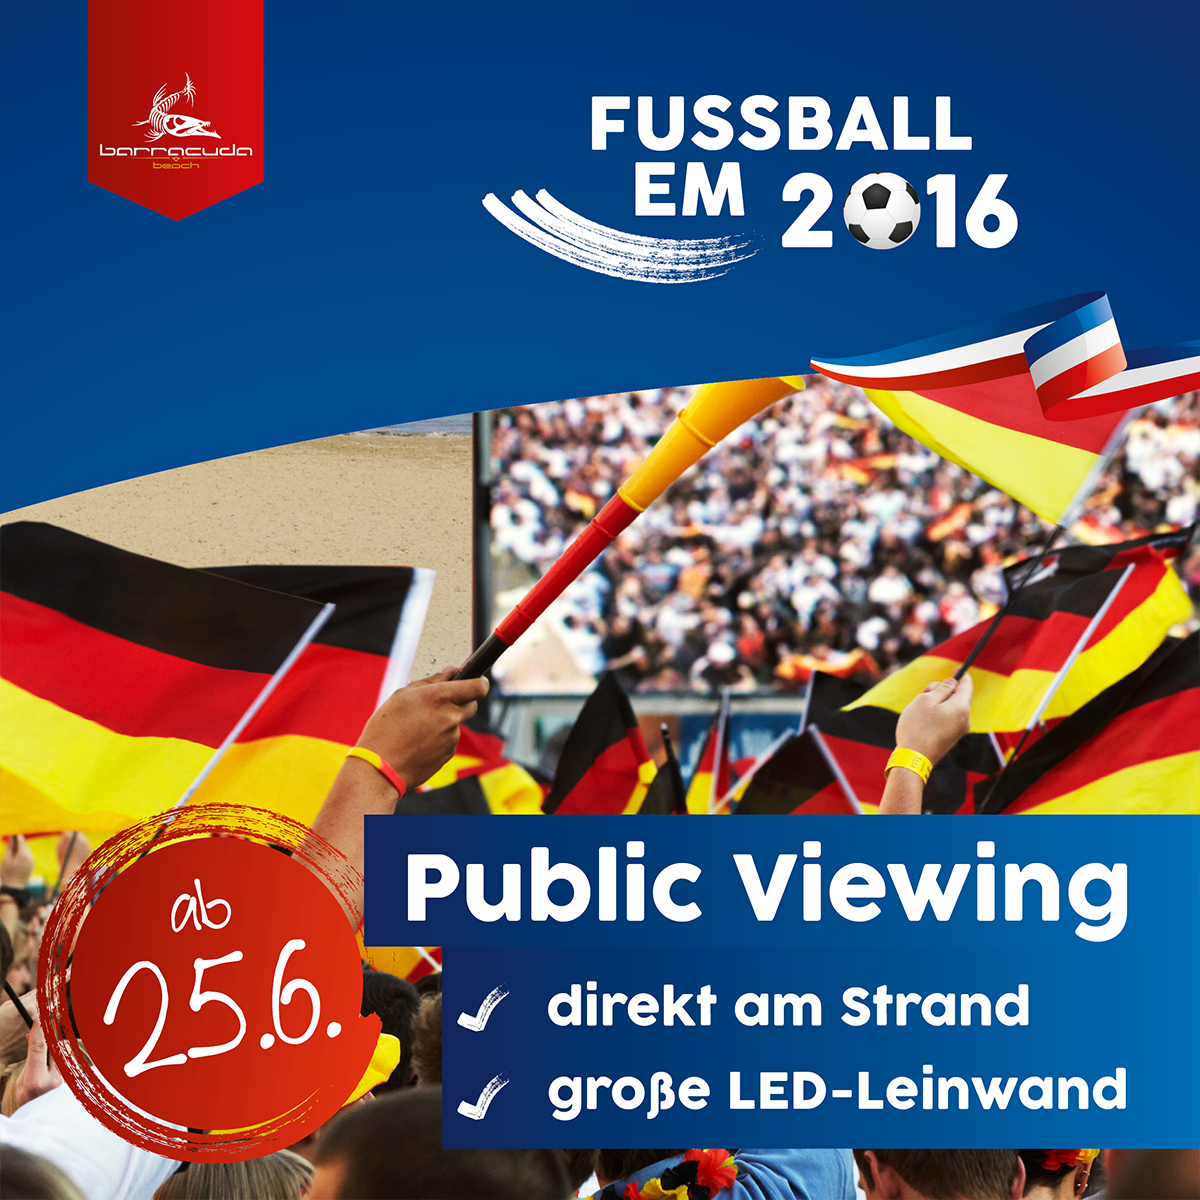 Public-Viewing-Fußball-EM-große-LED-Wand